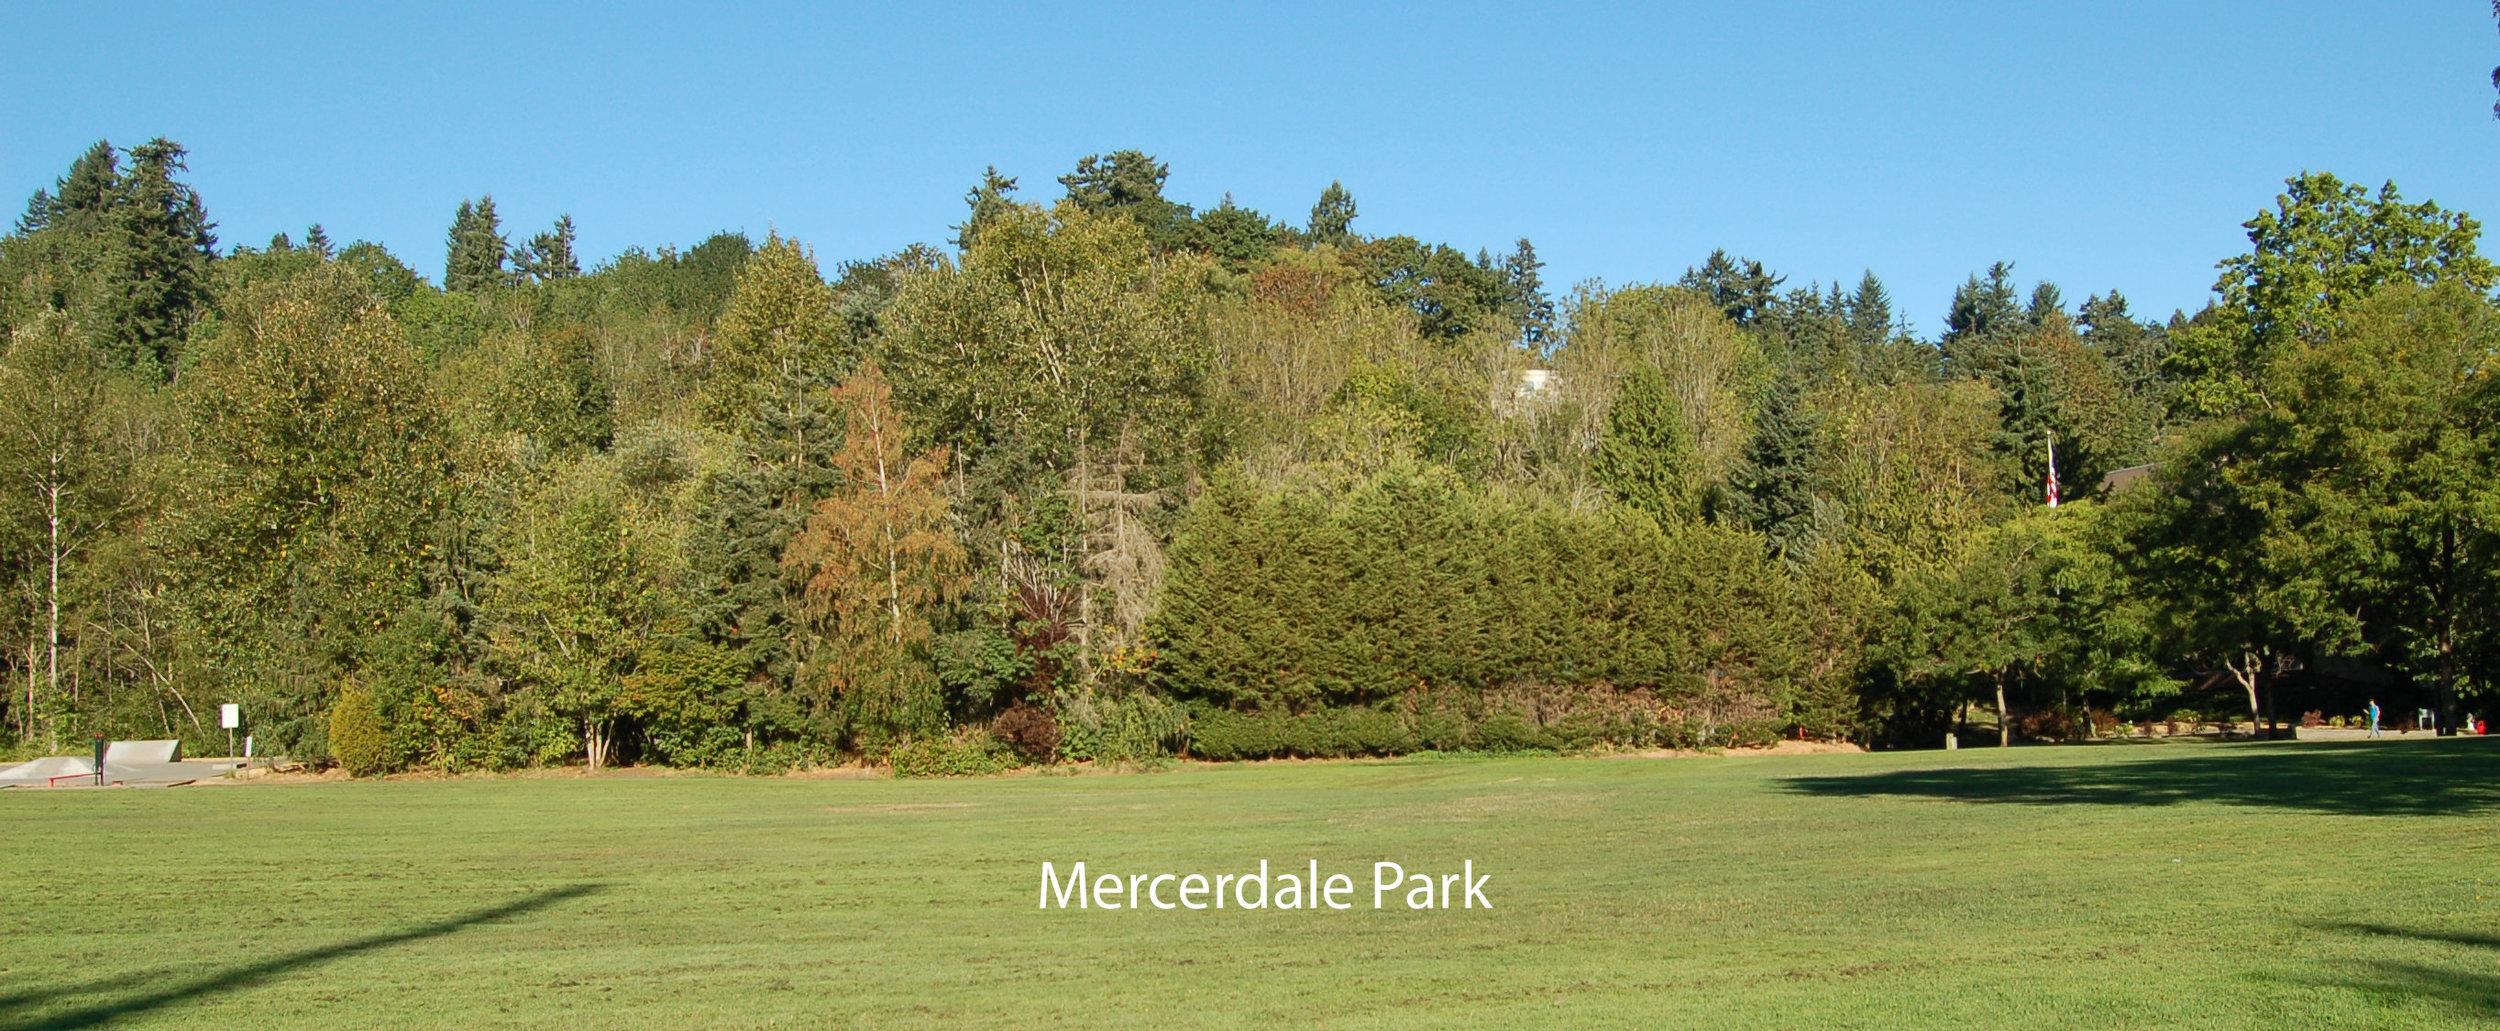 MICA_in_Mercerdale before with Name.jpg